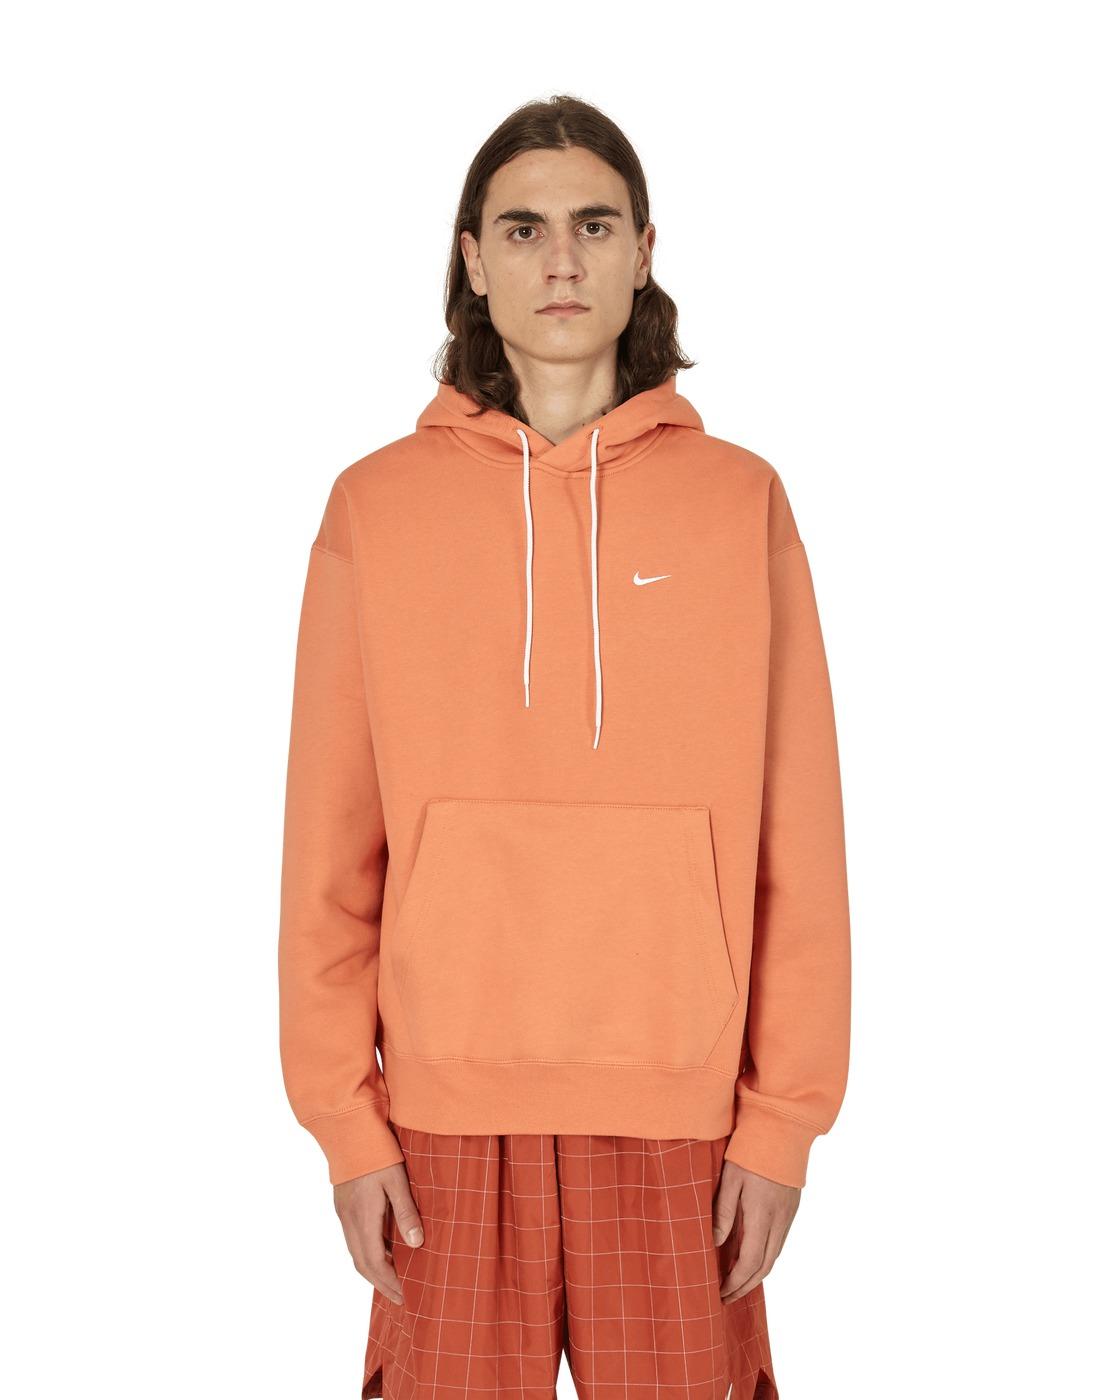 Nike Special Project Hooded Sweatshirt Healing Orange